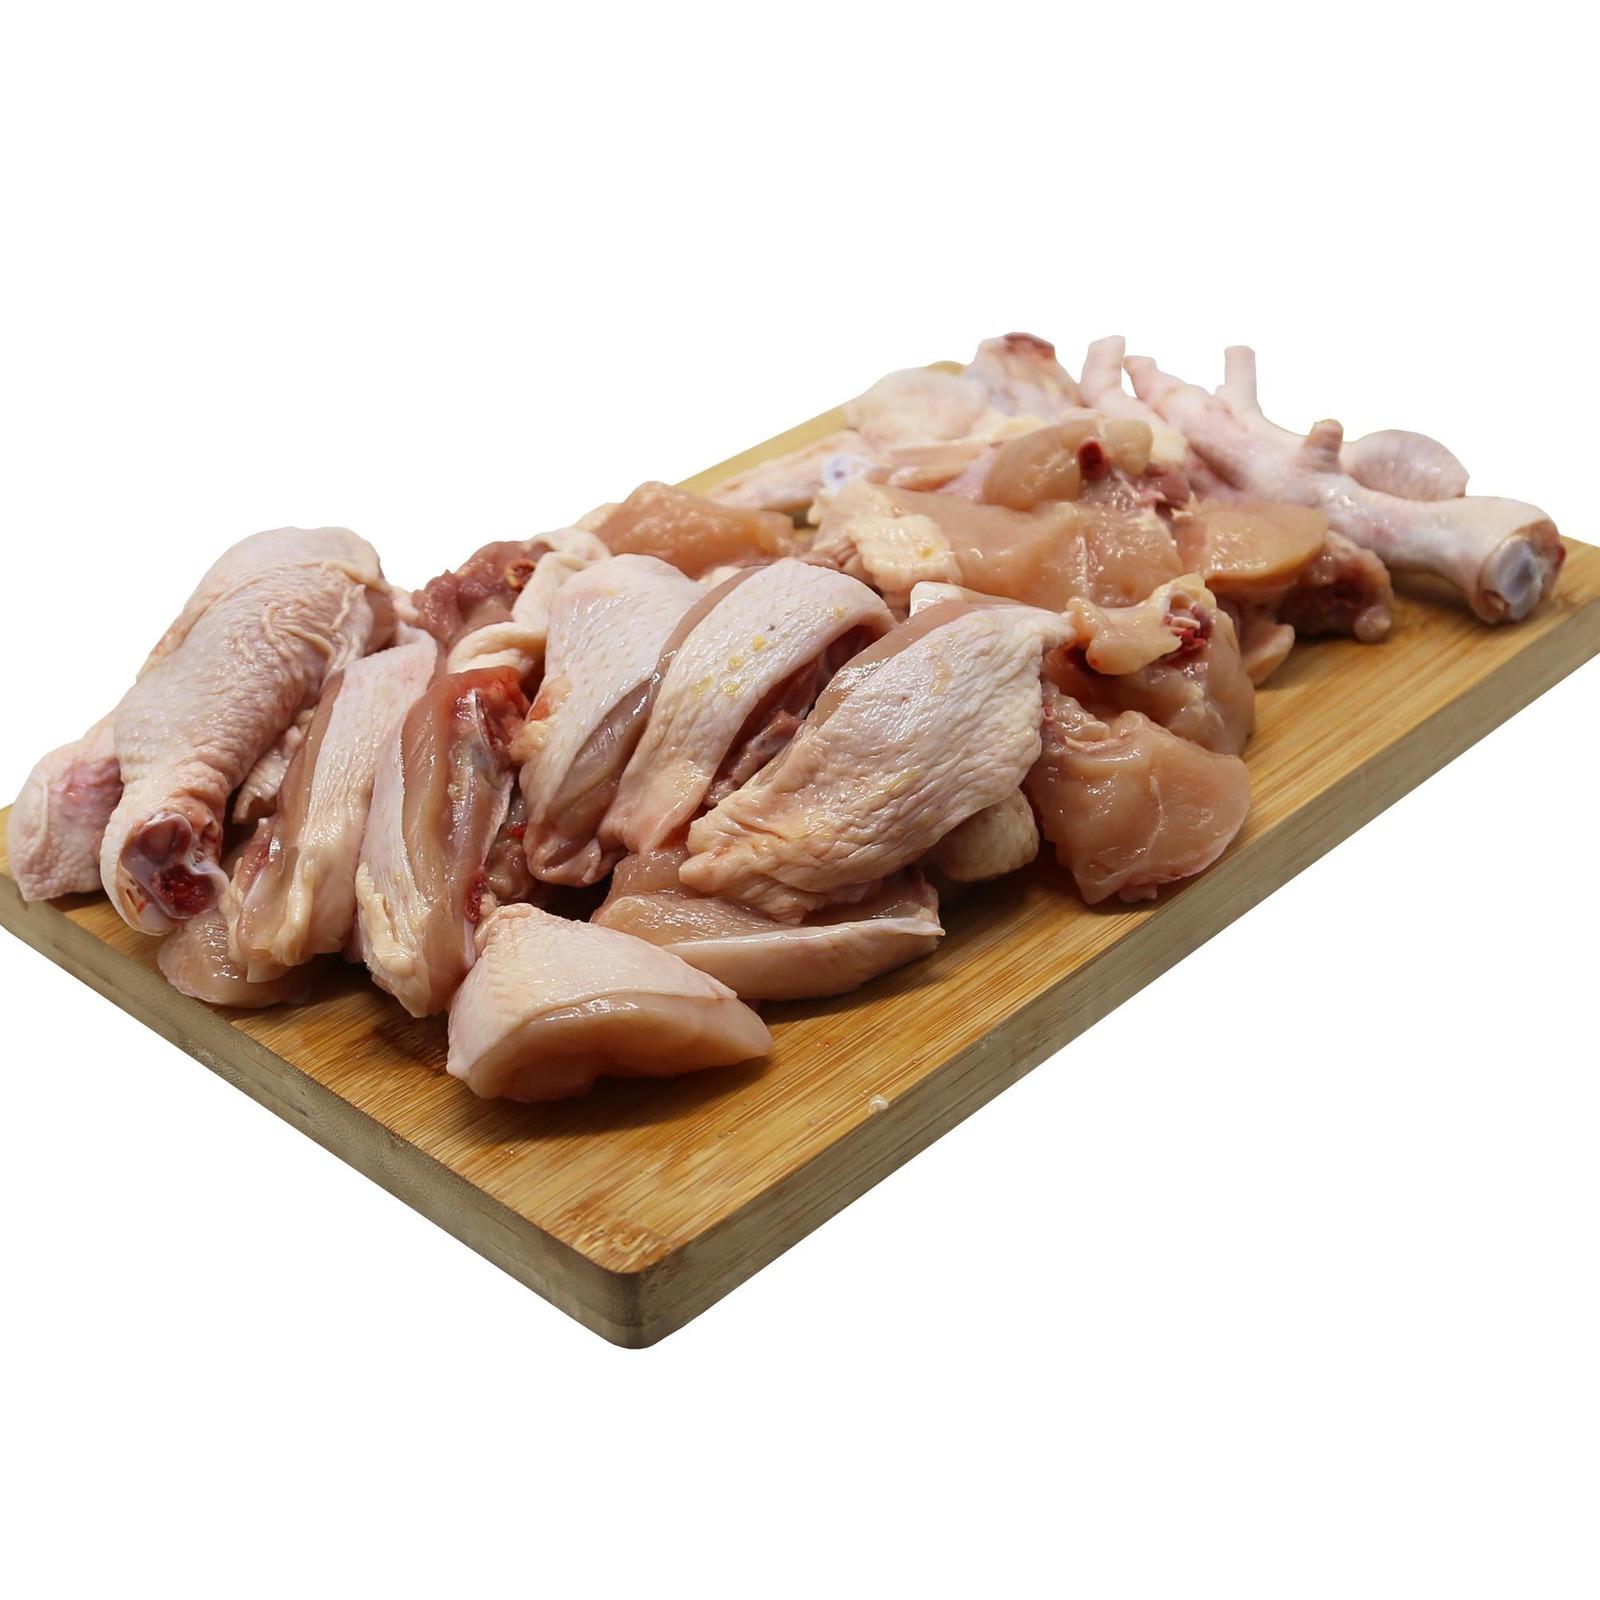 Aw's Market Chopped Whole Chicken Medium